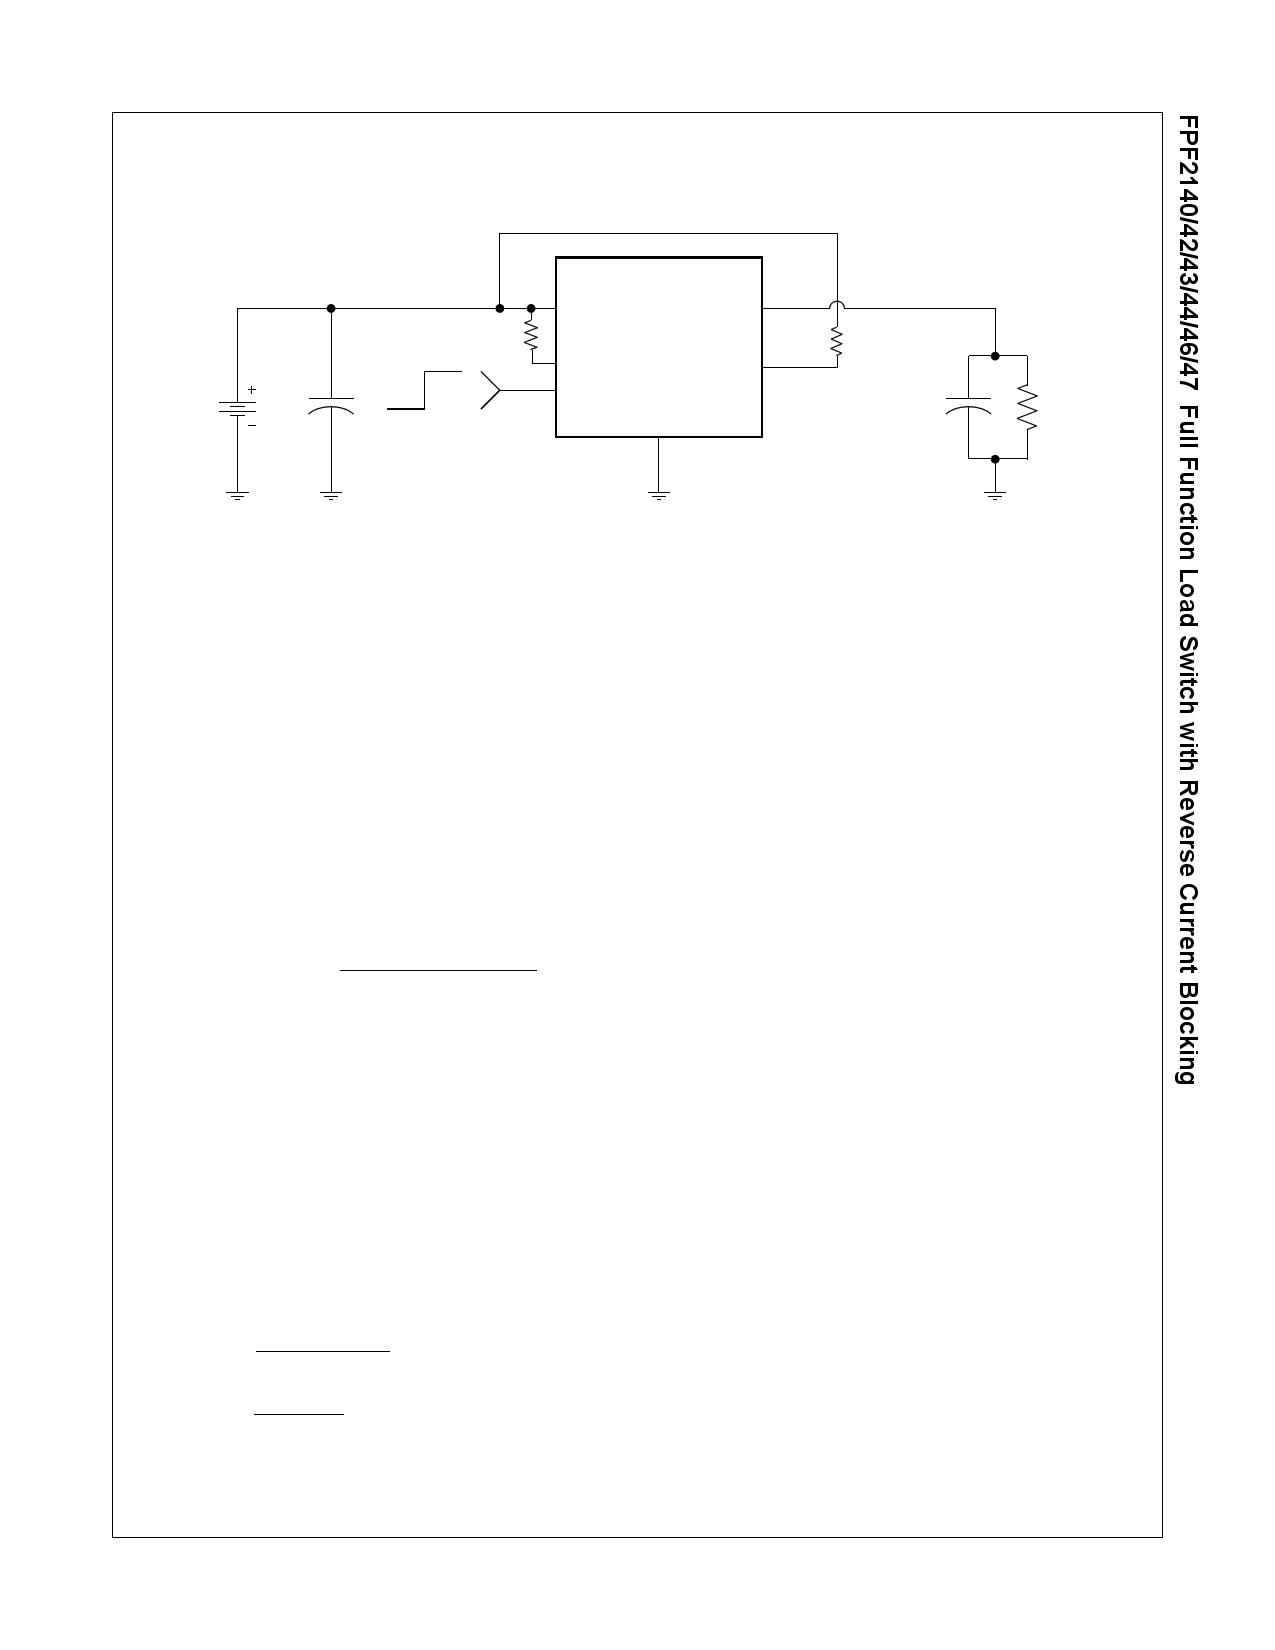 FPF2144 arduino